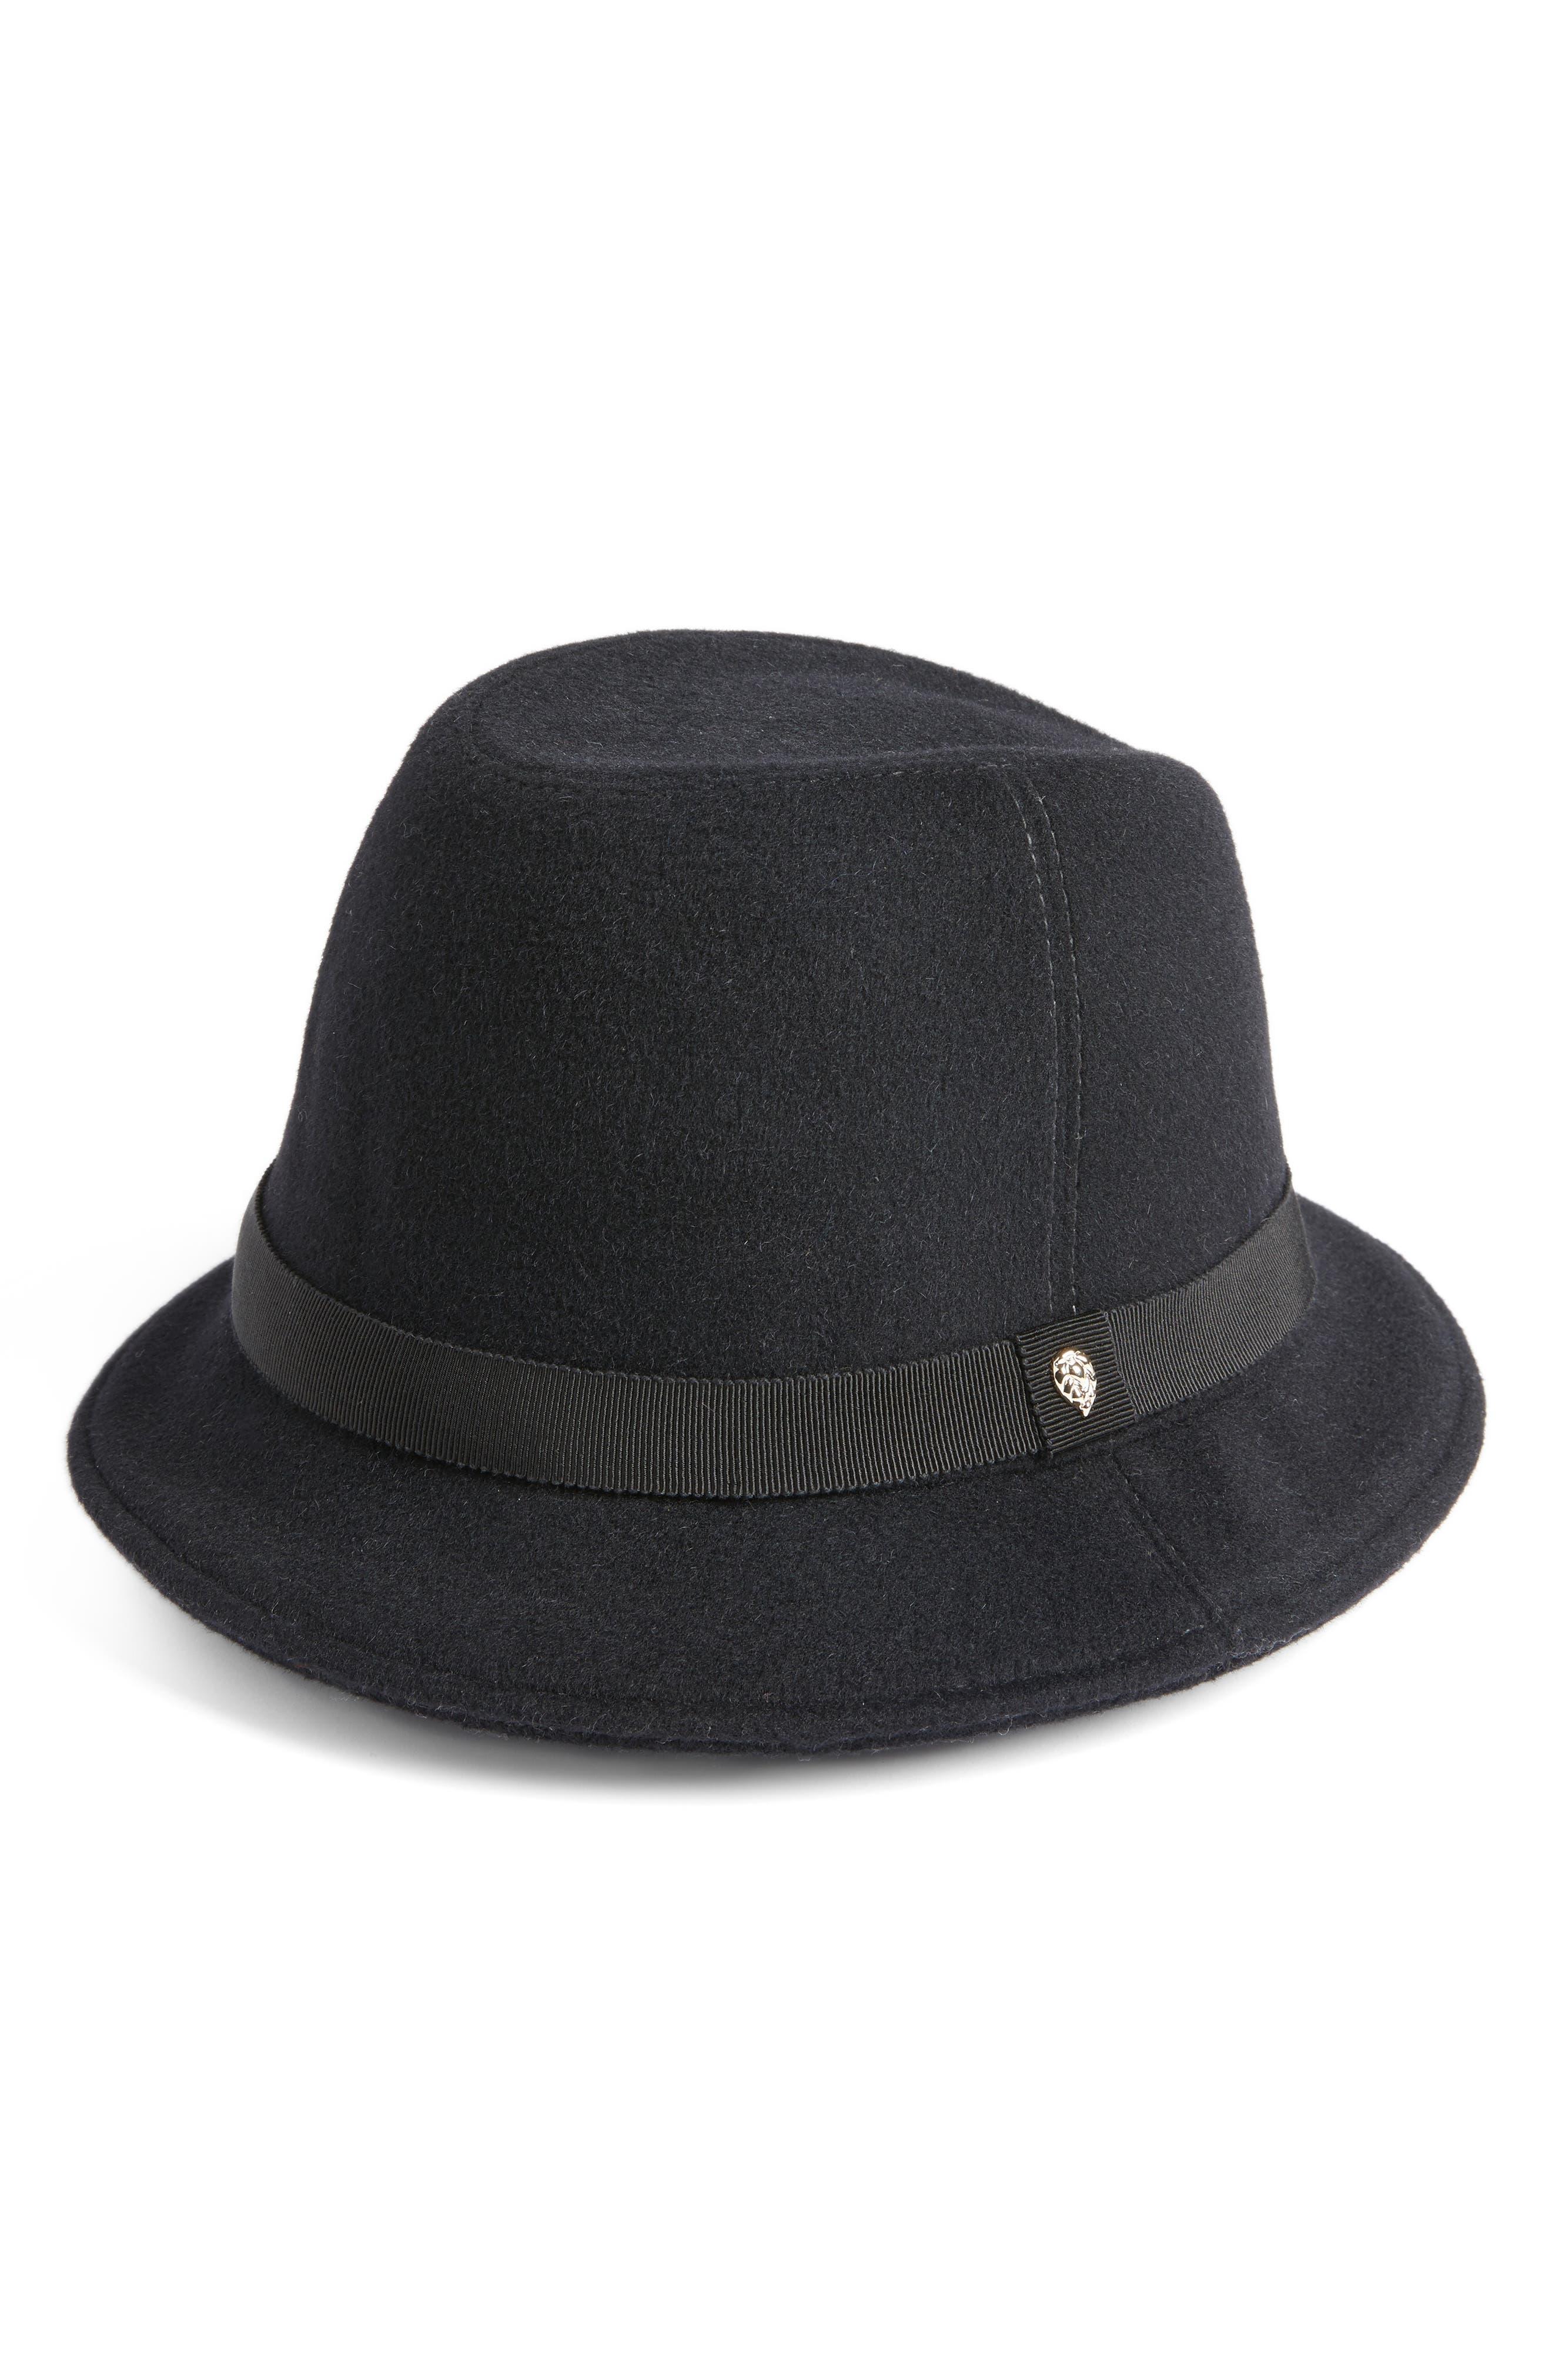 Alternate Image 1 Selected - Helen Kaminski Luxe Tapered Cloche Hat